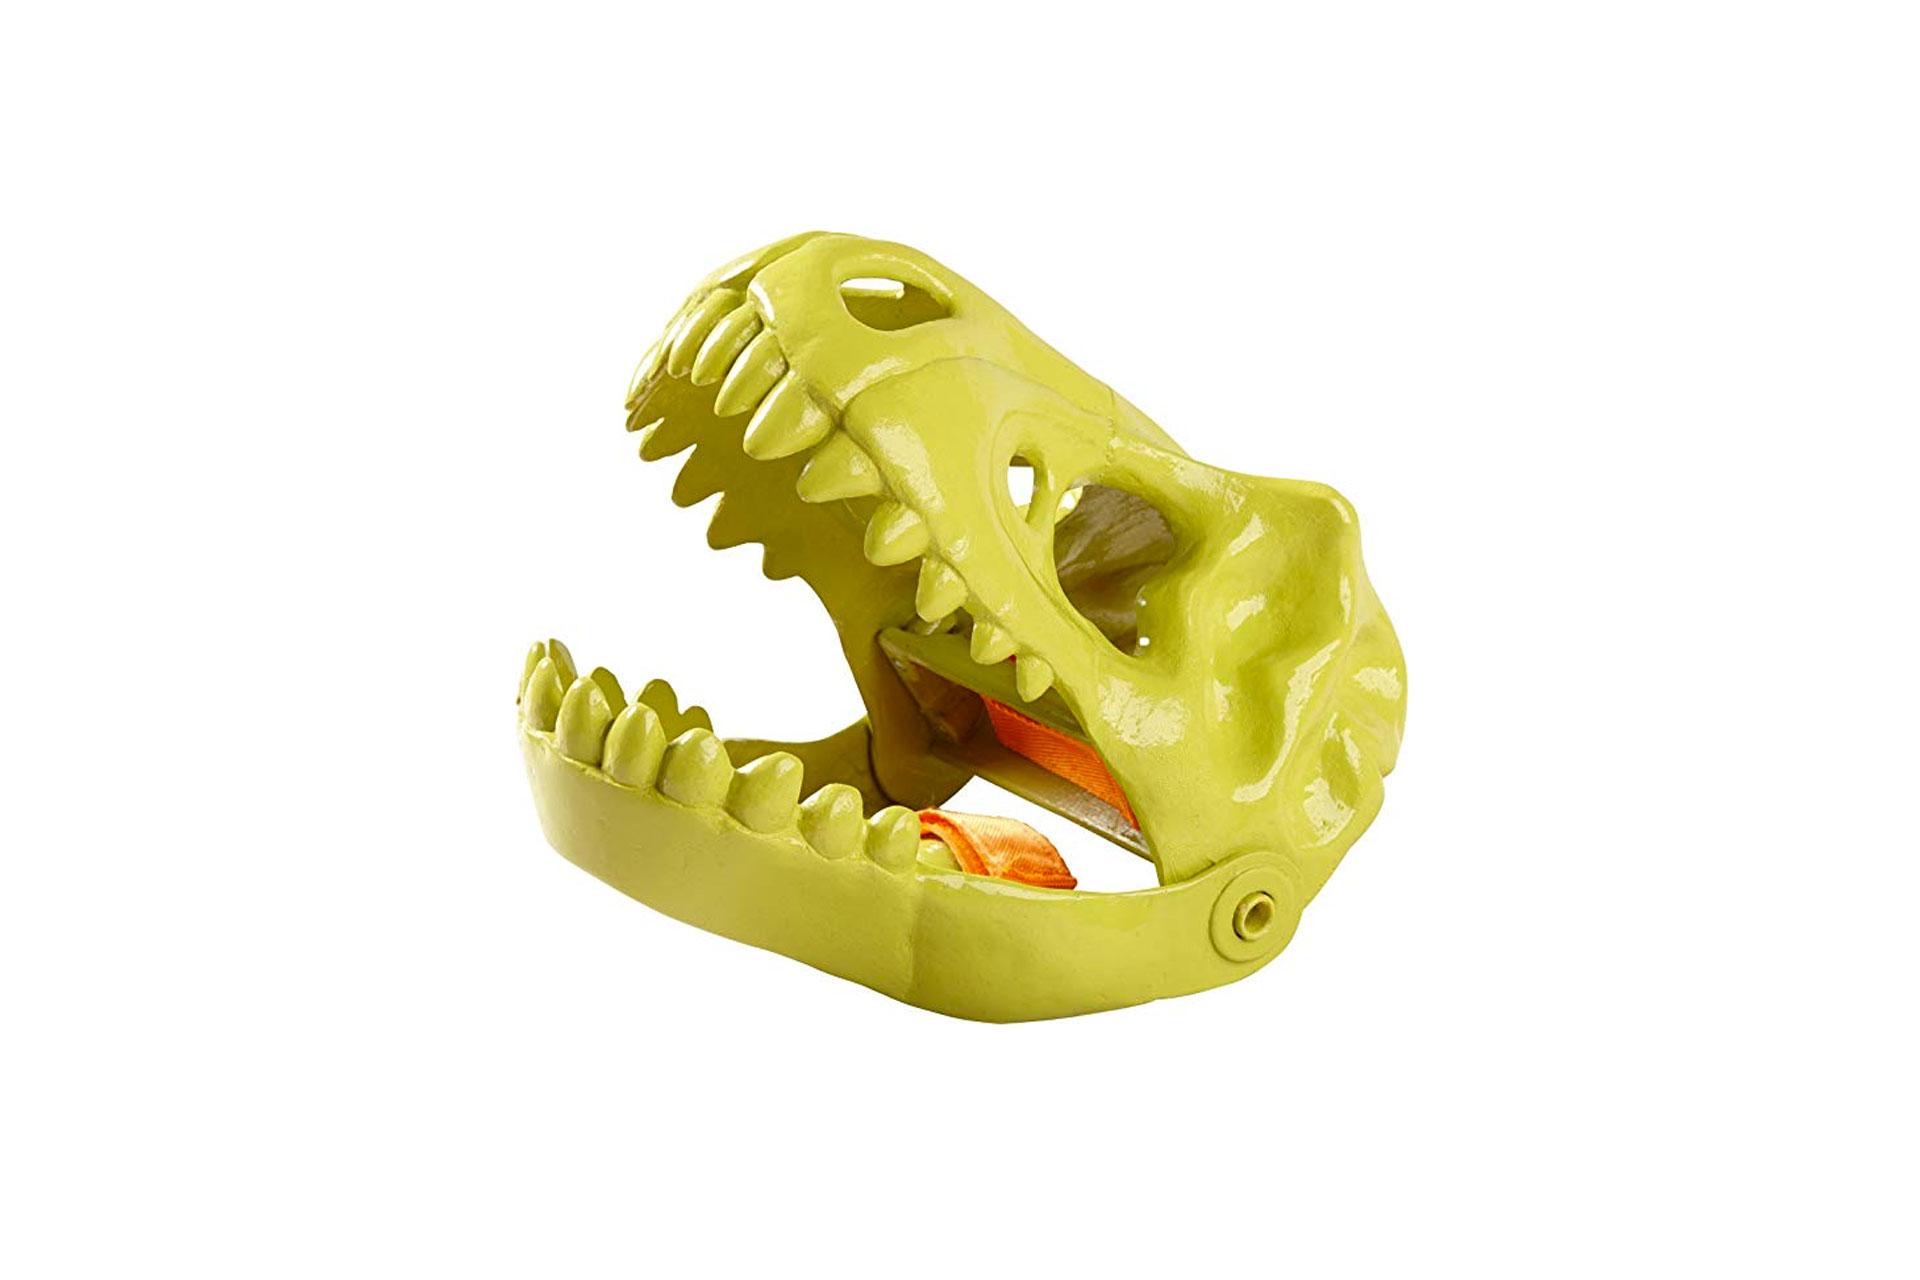 HABA Dinosaur Hand Glove; Courtesy of Amazon